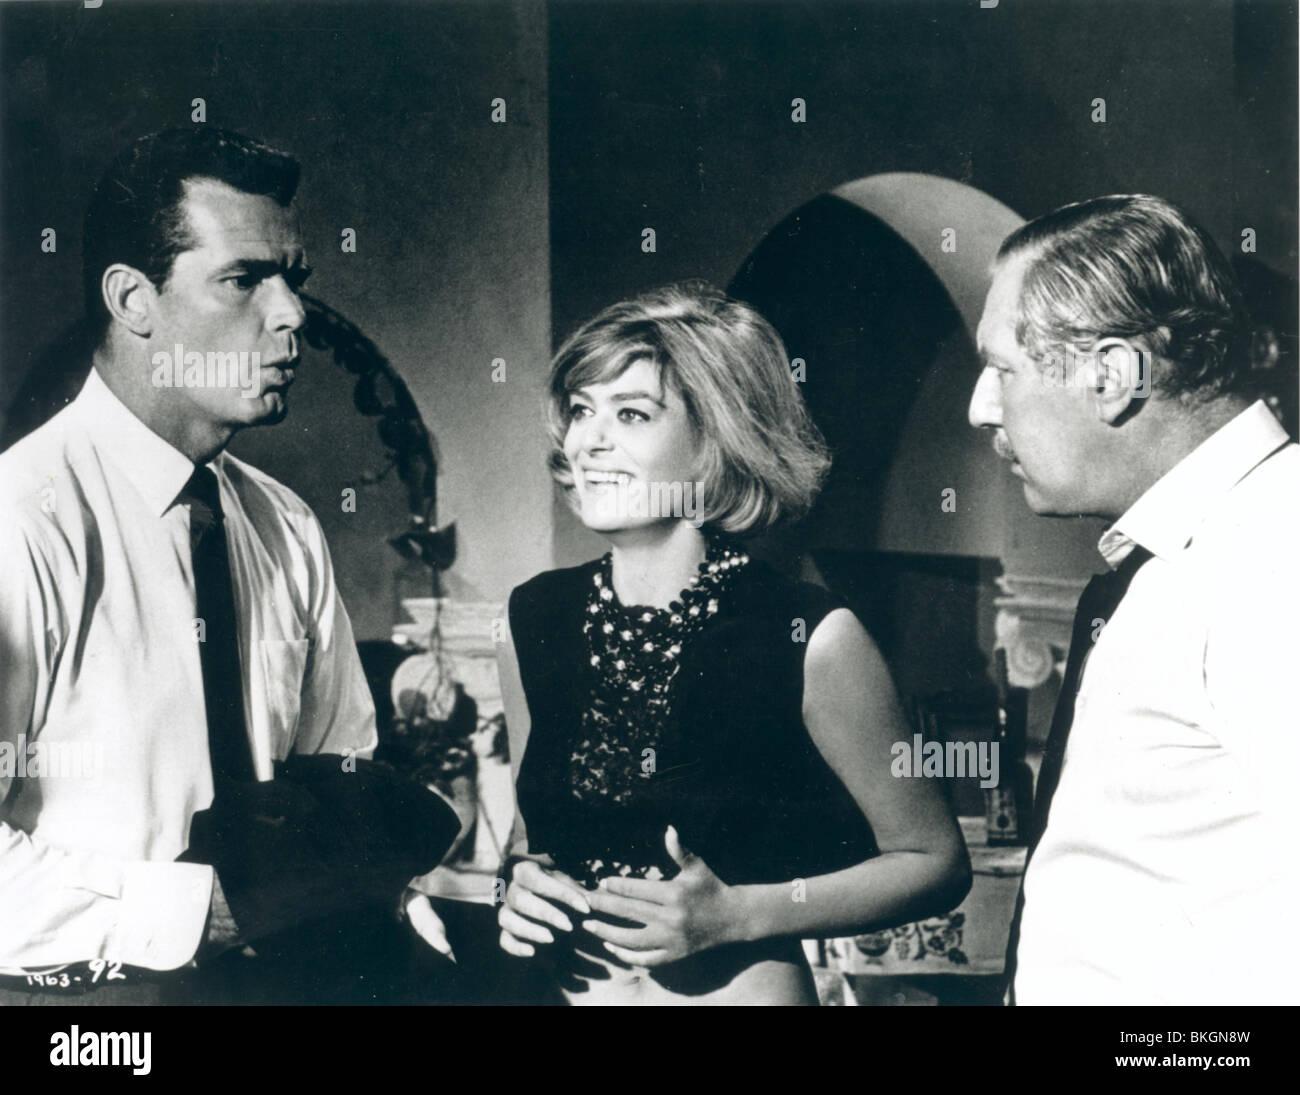 A MAN COULD GET KILLED (1966) JAMES GARNER, MELINA MERCOURI, ROBERT COOTE MANC 001 - Stock Image